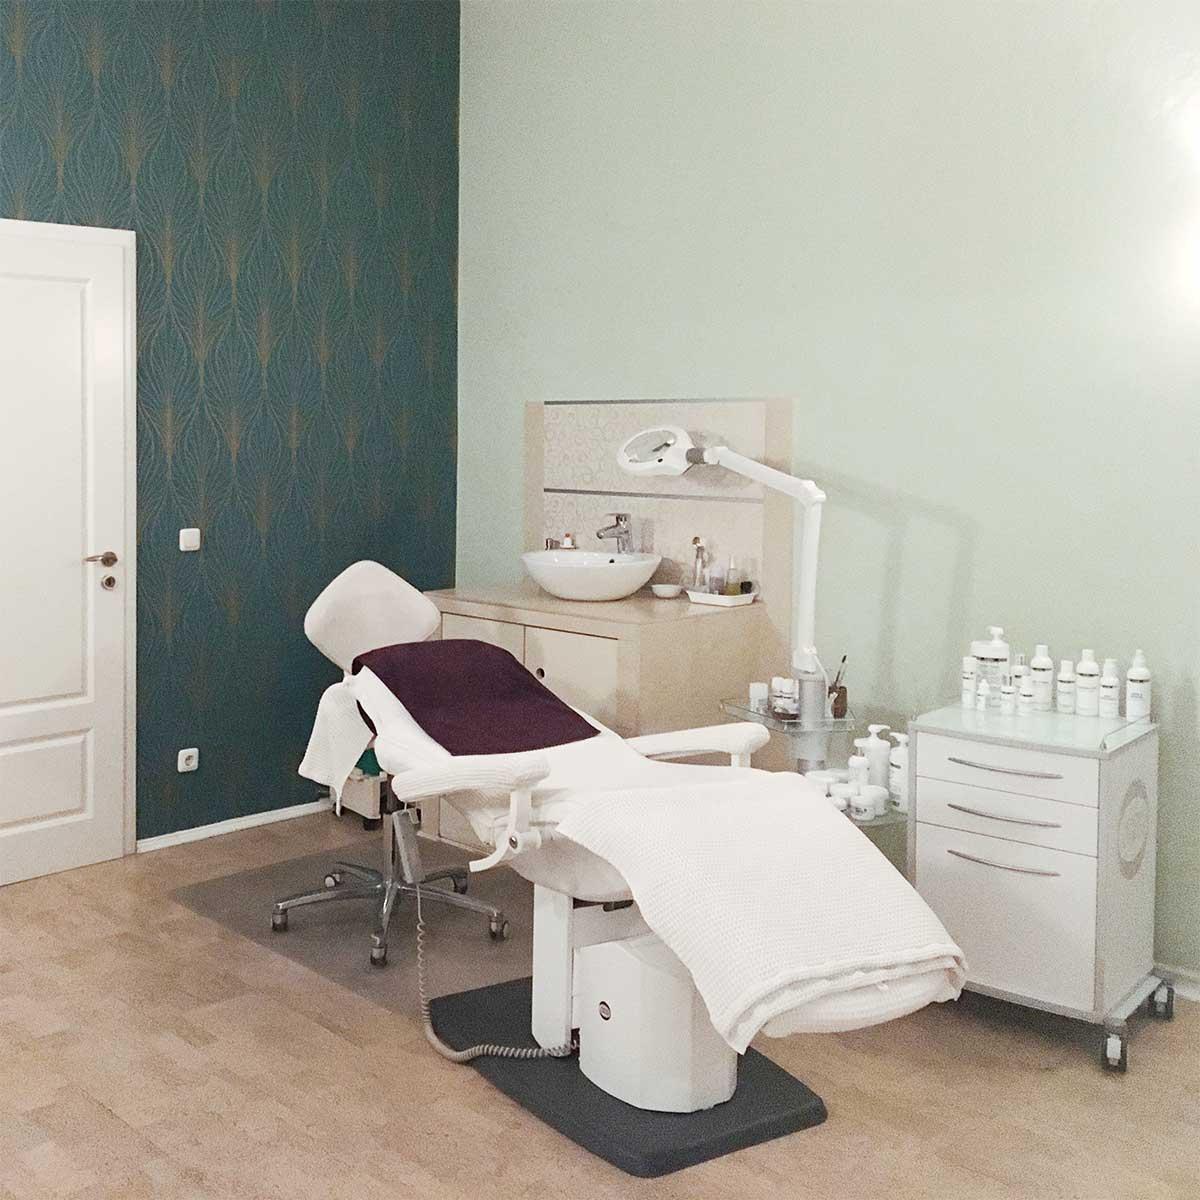 warias-kosmetik-studio-berlin-charlottenburg-behandlungzimmer